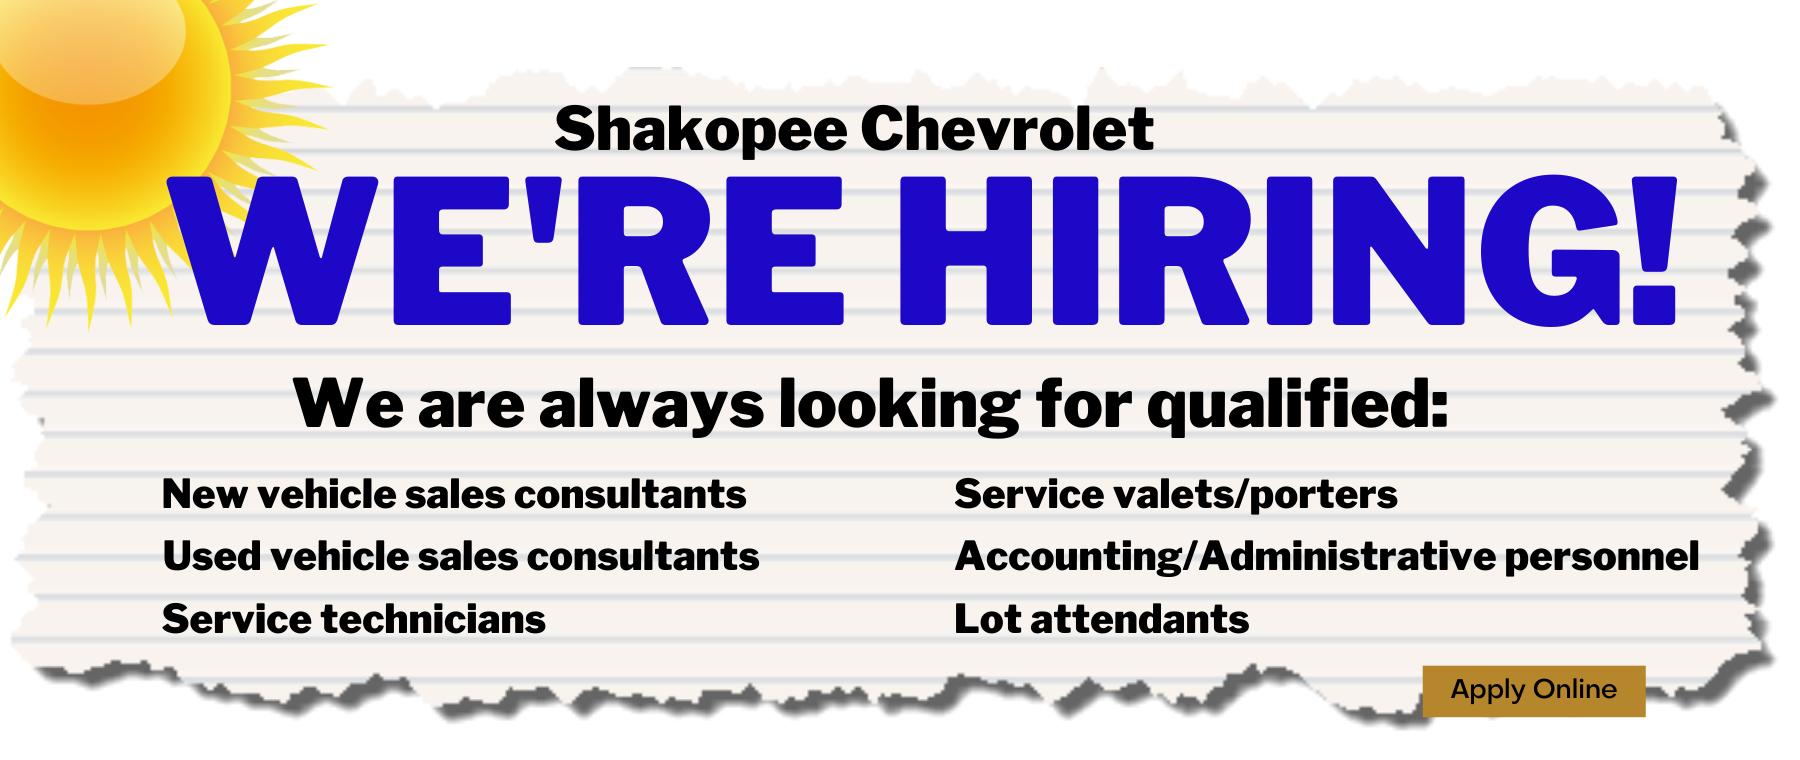 We're Hiring at Shakopee Chevrolet